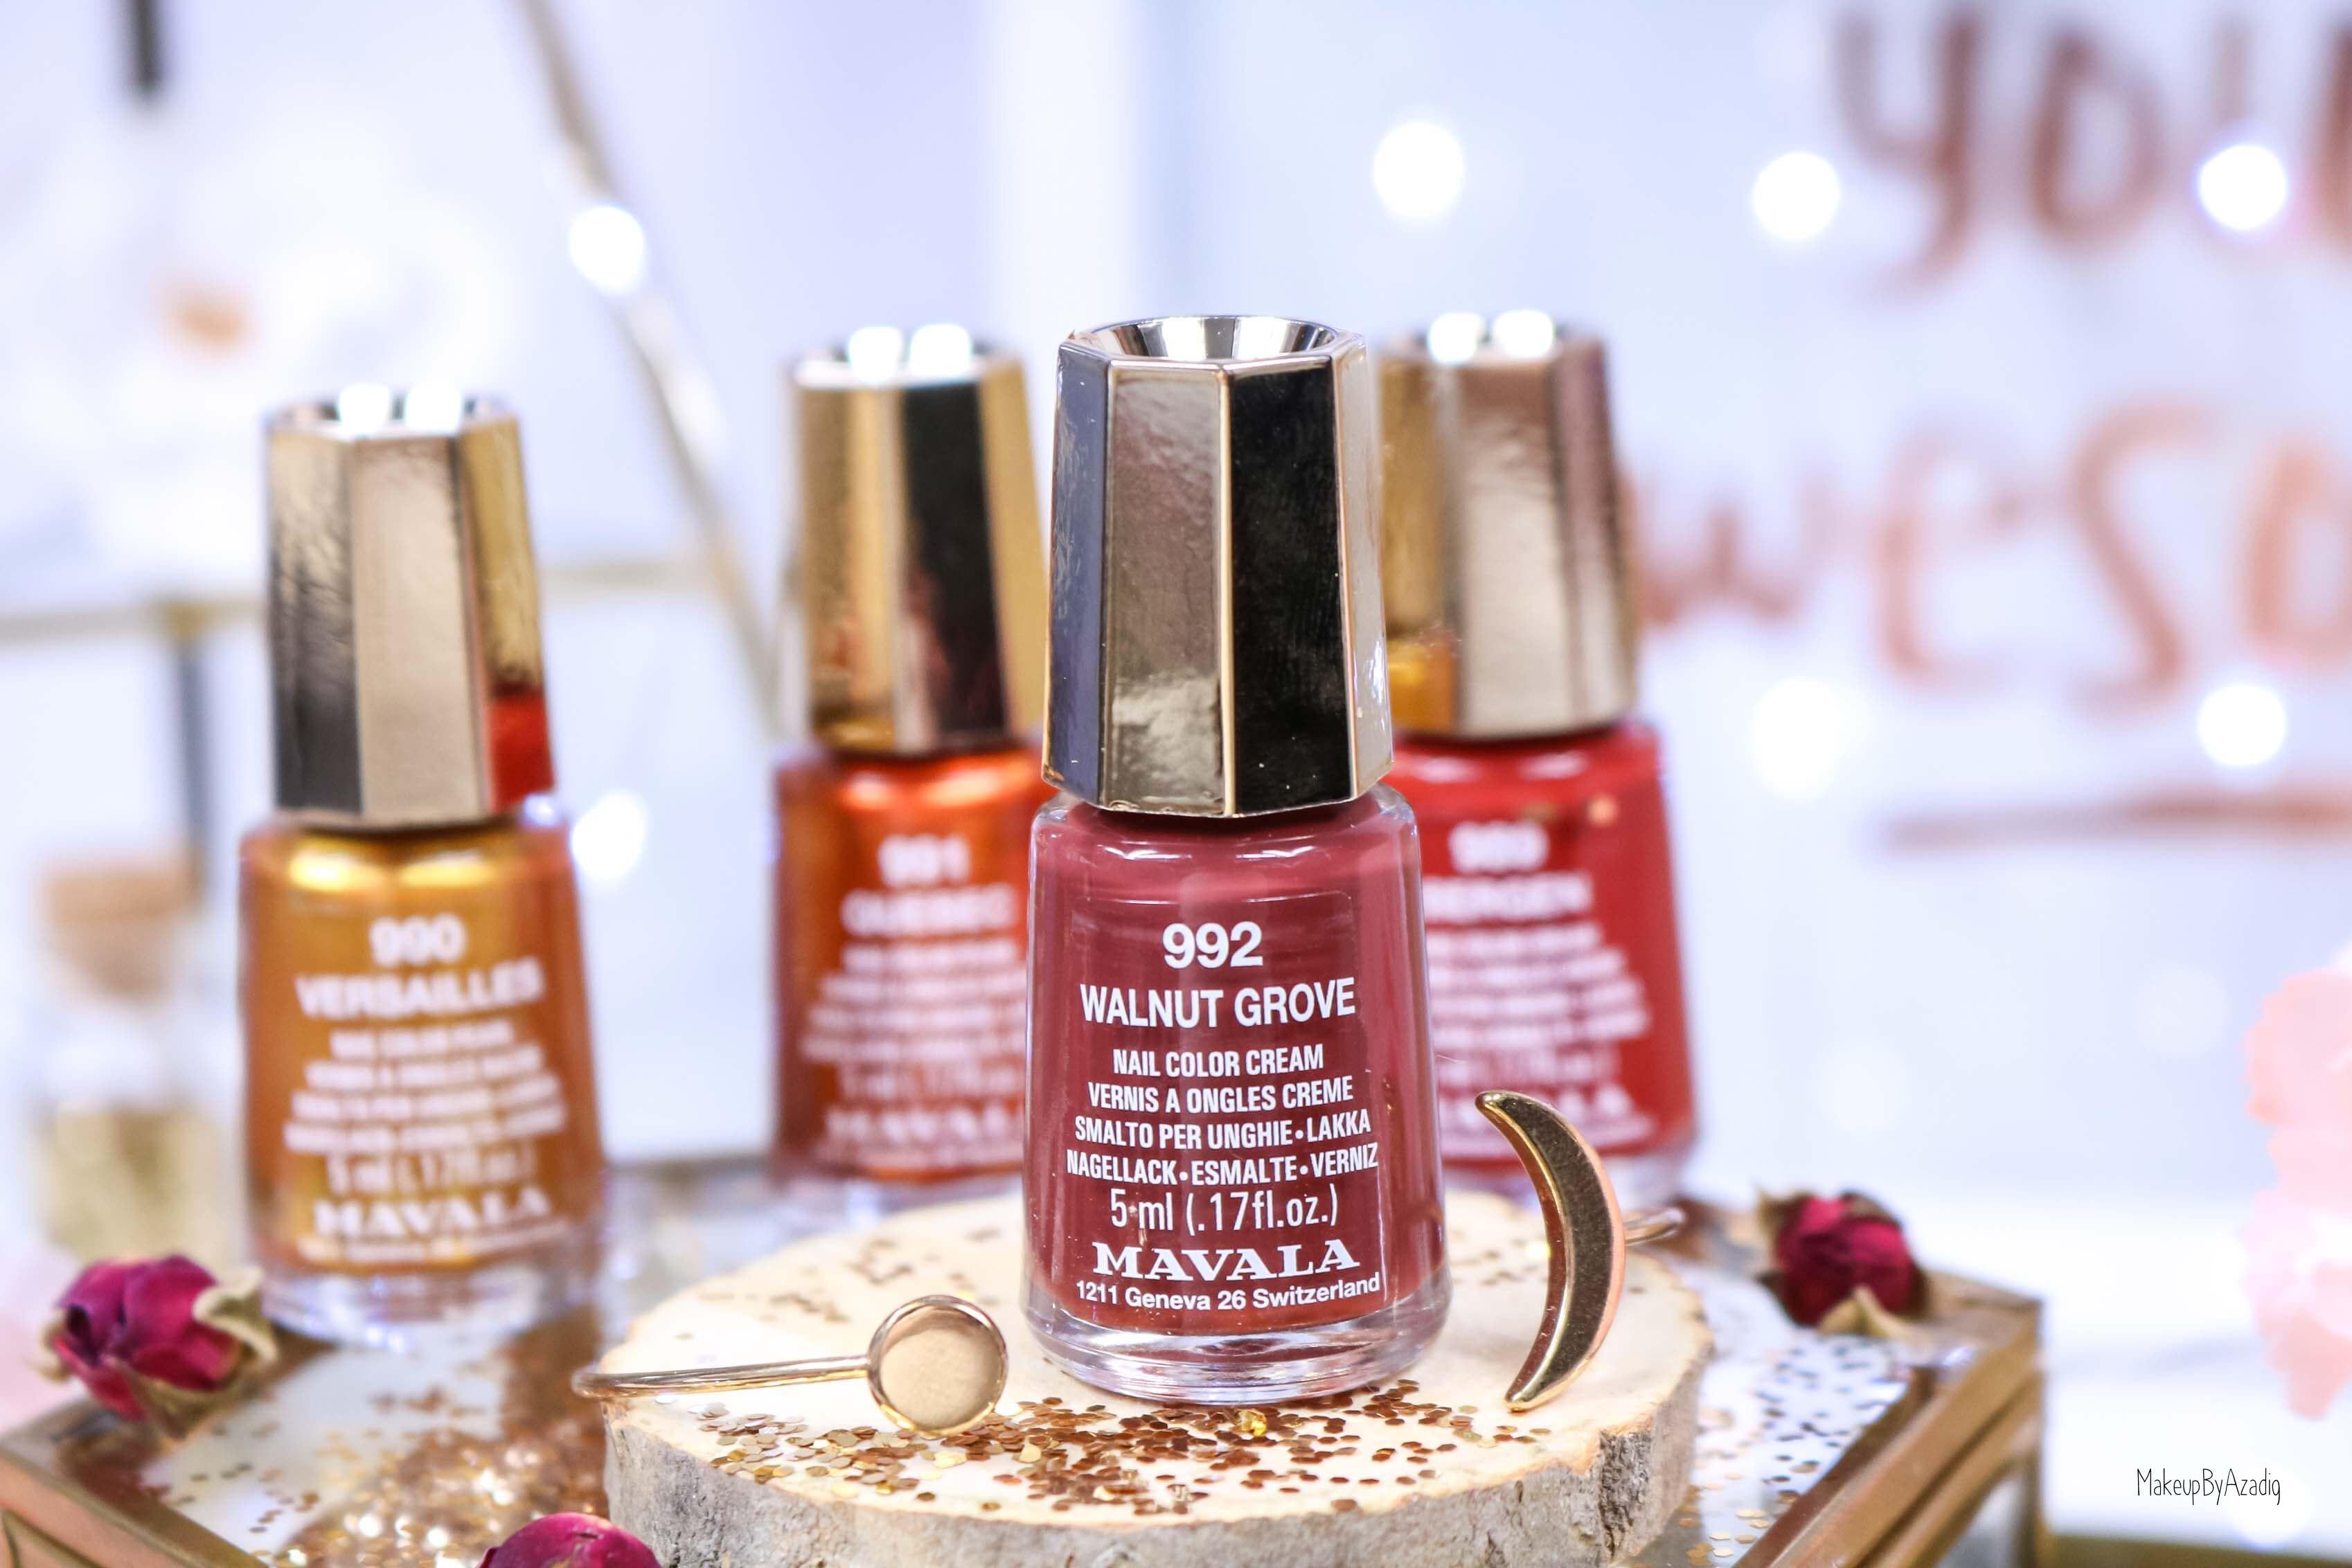 revue-collection-vernis-mavala-nails-heritage-chic-bordeaux-cuivre-metallique-gold-rouge-makeupbyazadig-swatch-avis-prix-walnut-grove